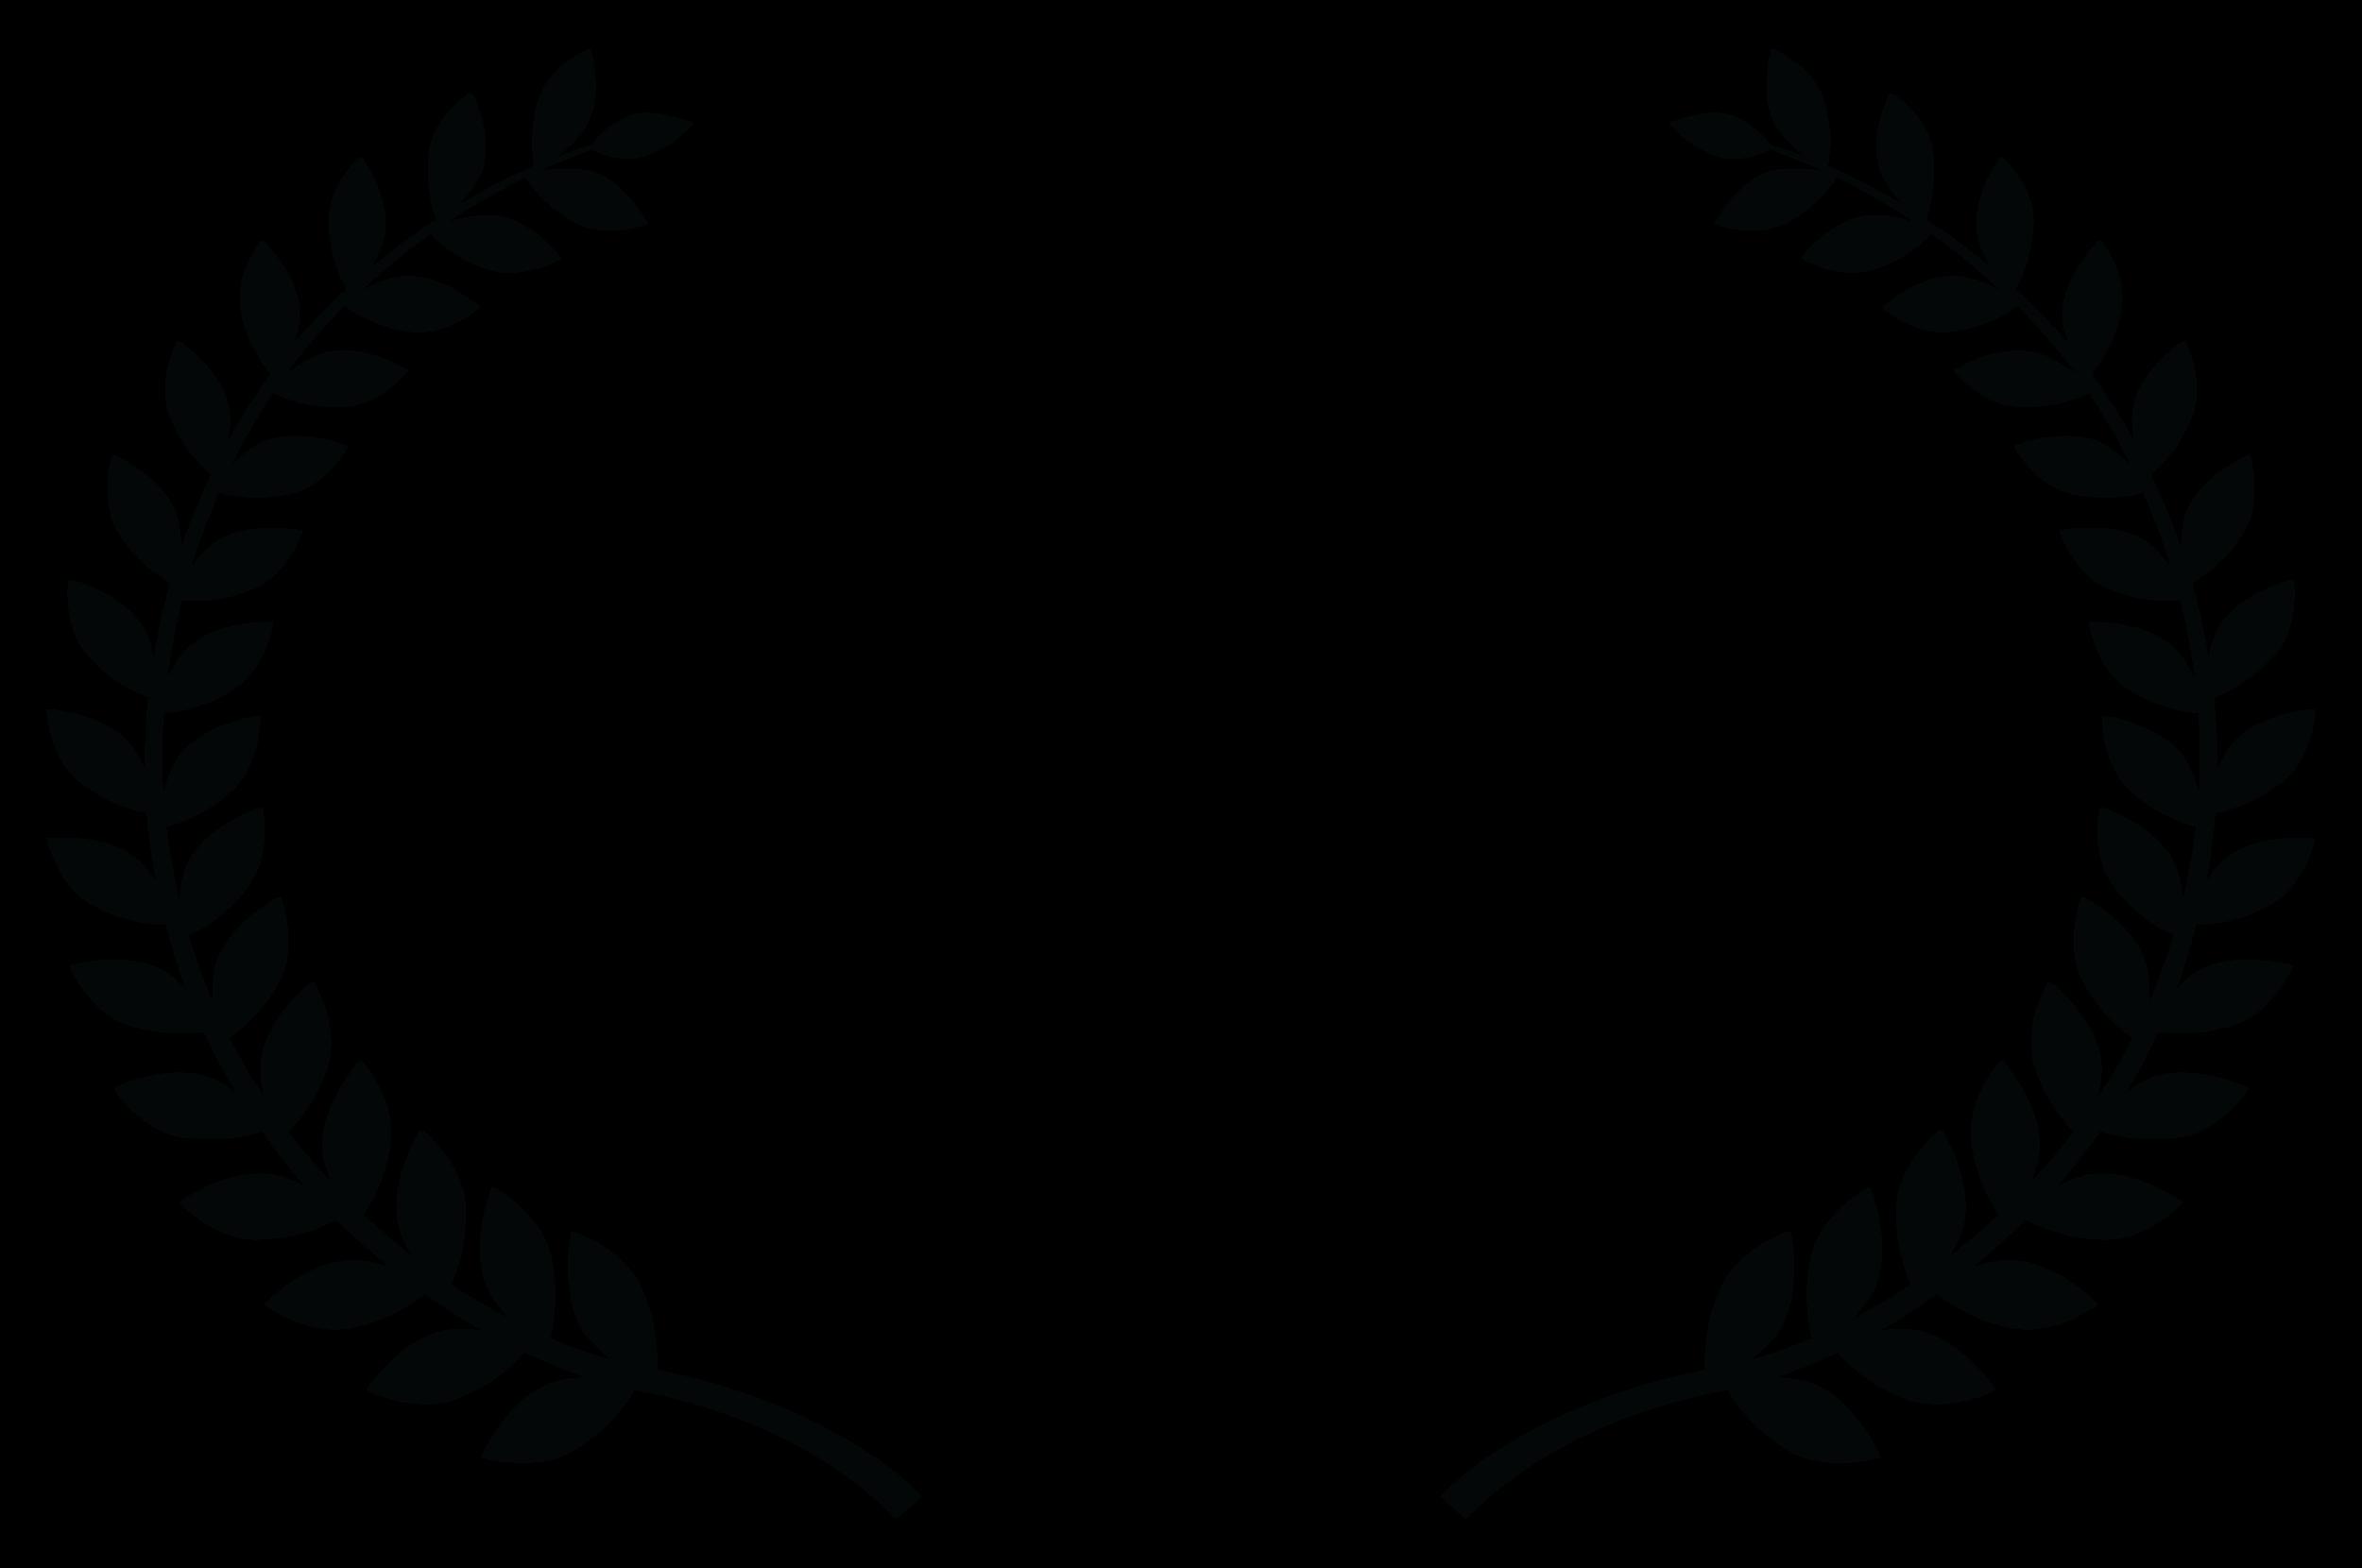 OFFICIALSELECTION-SanJoseInternationalShortFilmFestival-2018.png